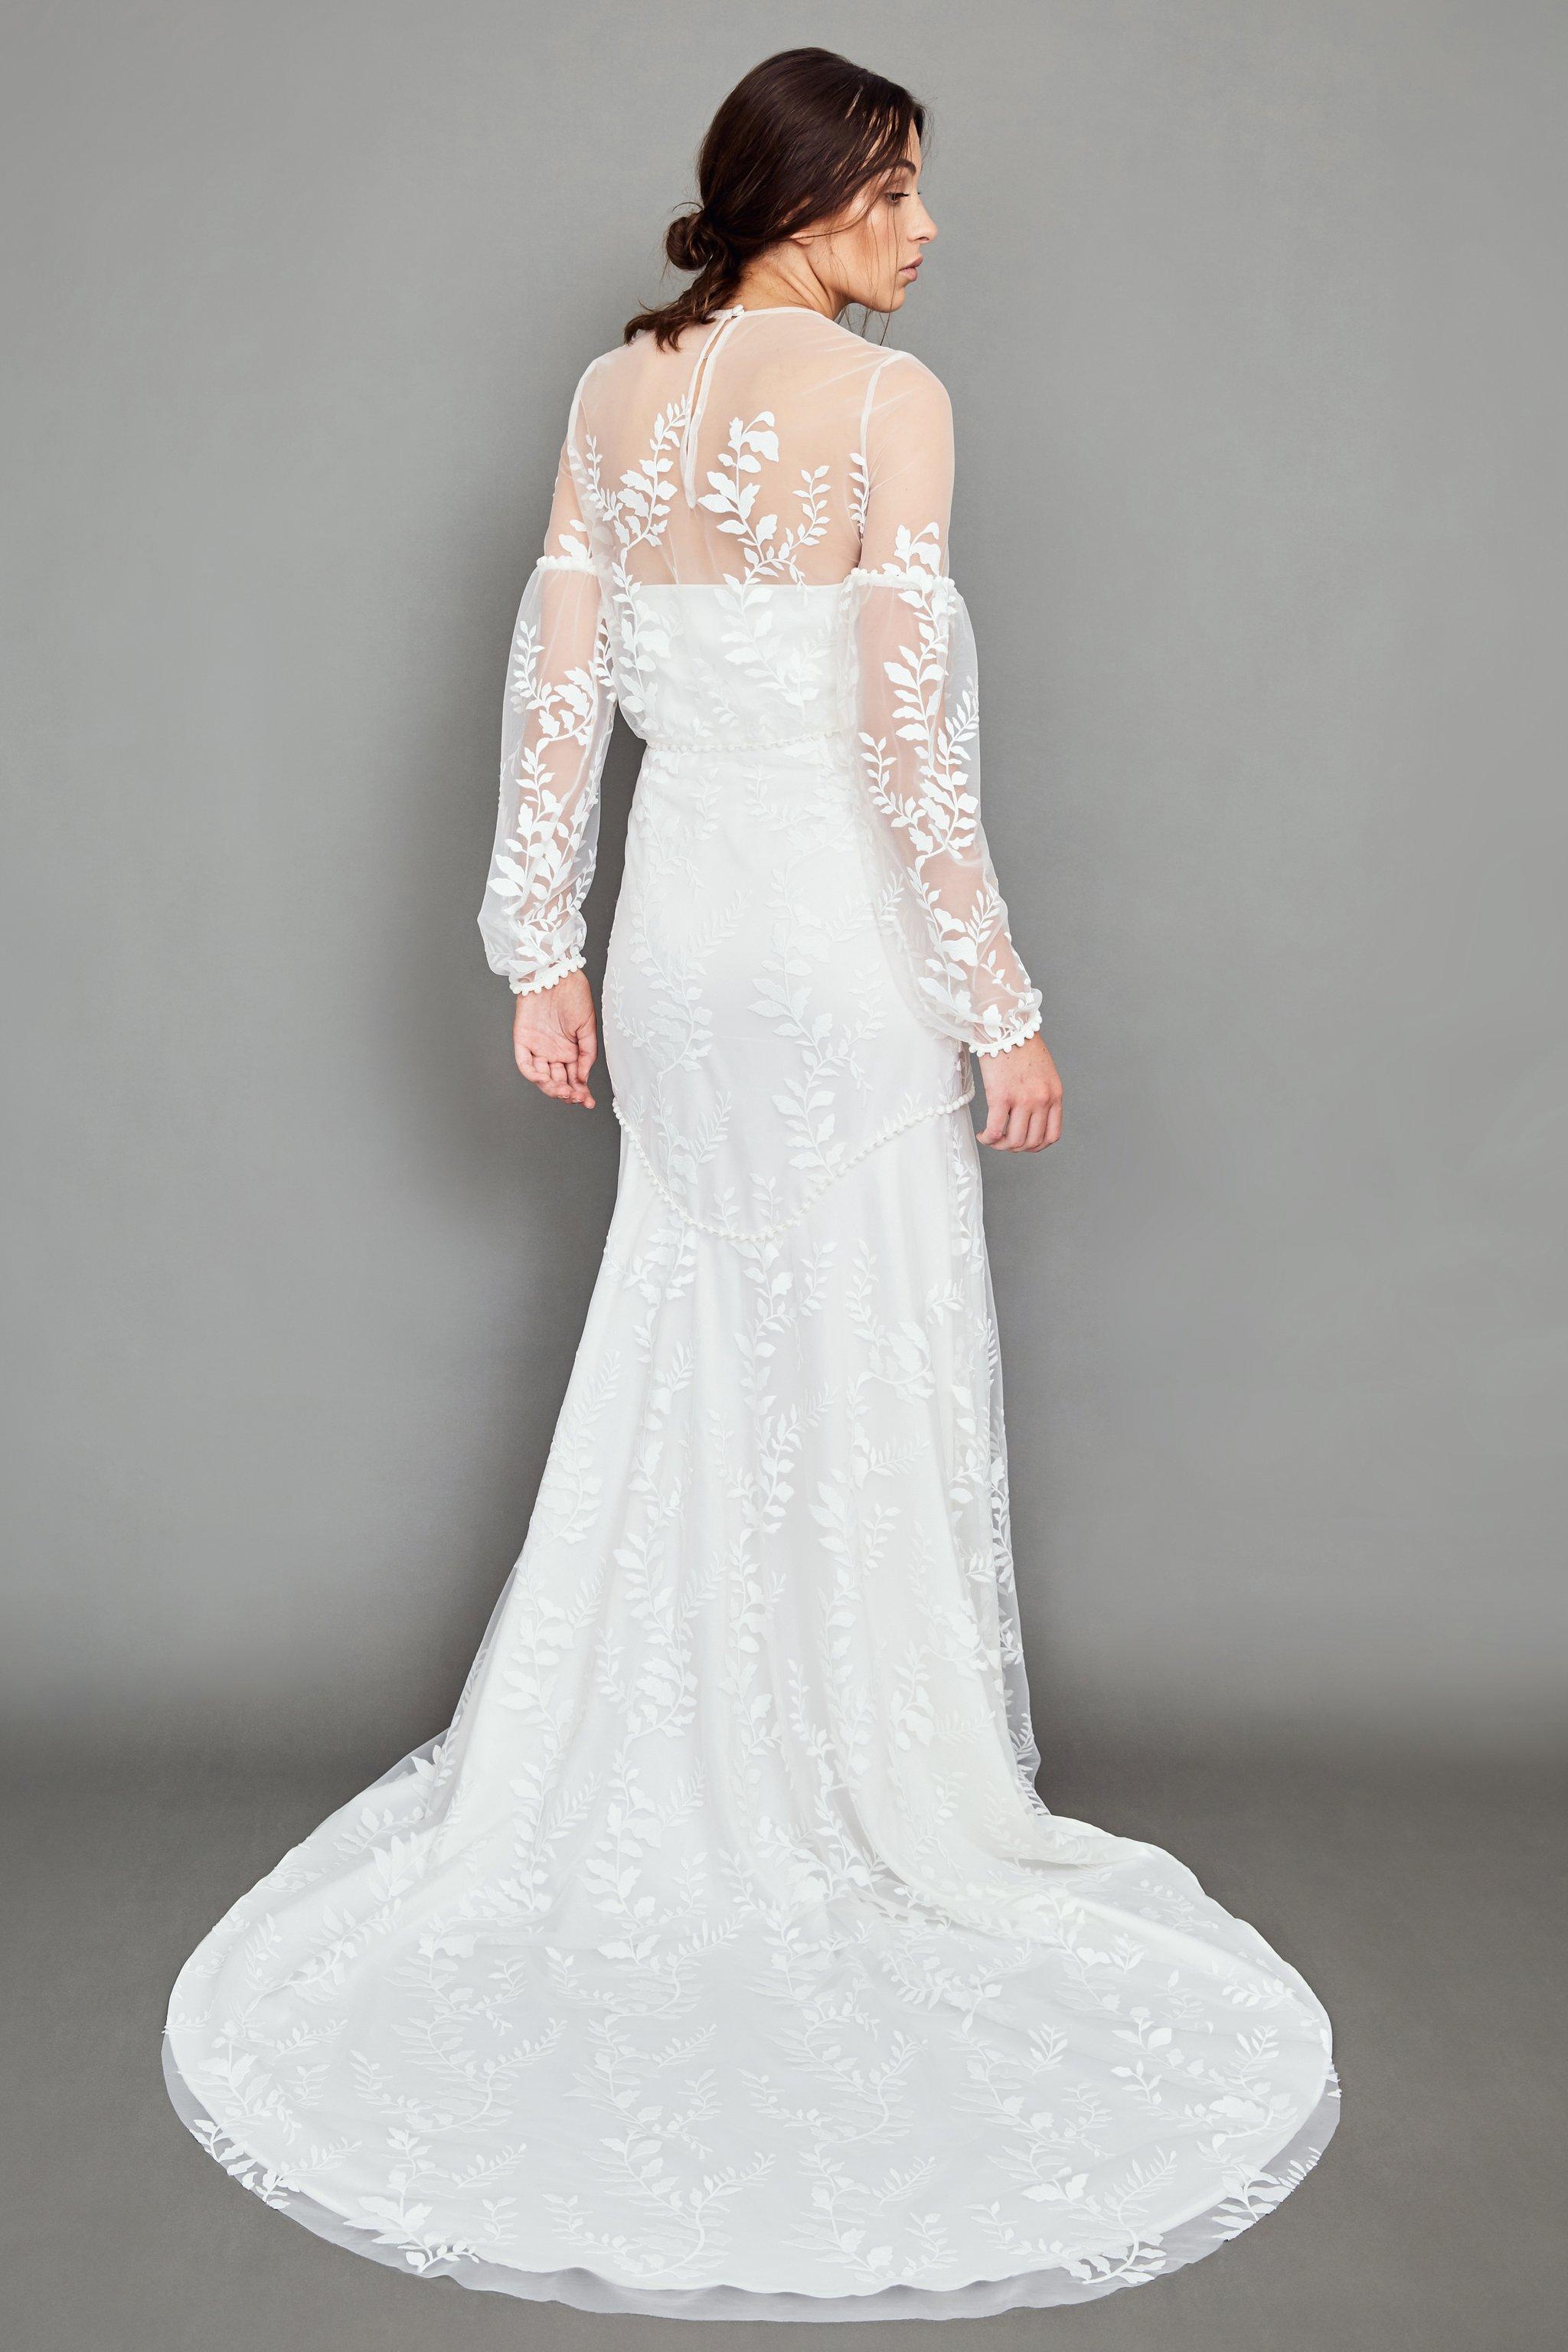 WHITE MEADOW BRIDAL Epic wedding dress | Wedding Dresses under $5,000 | LOVE FIND CO. Bridal Dress Directory